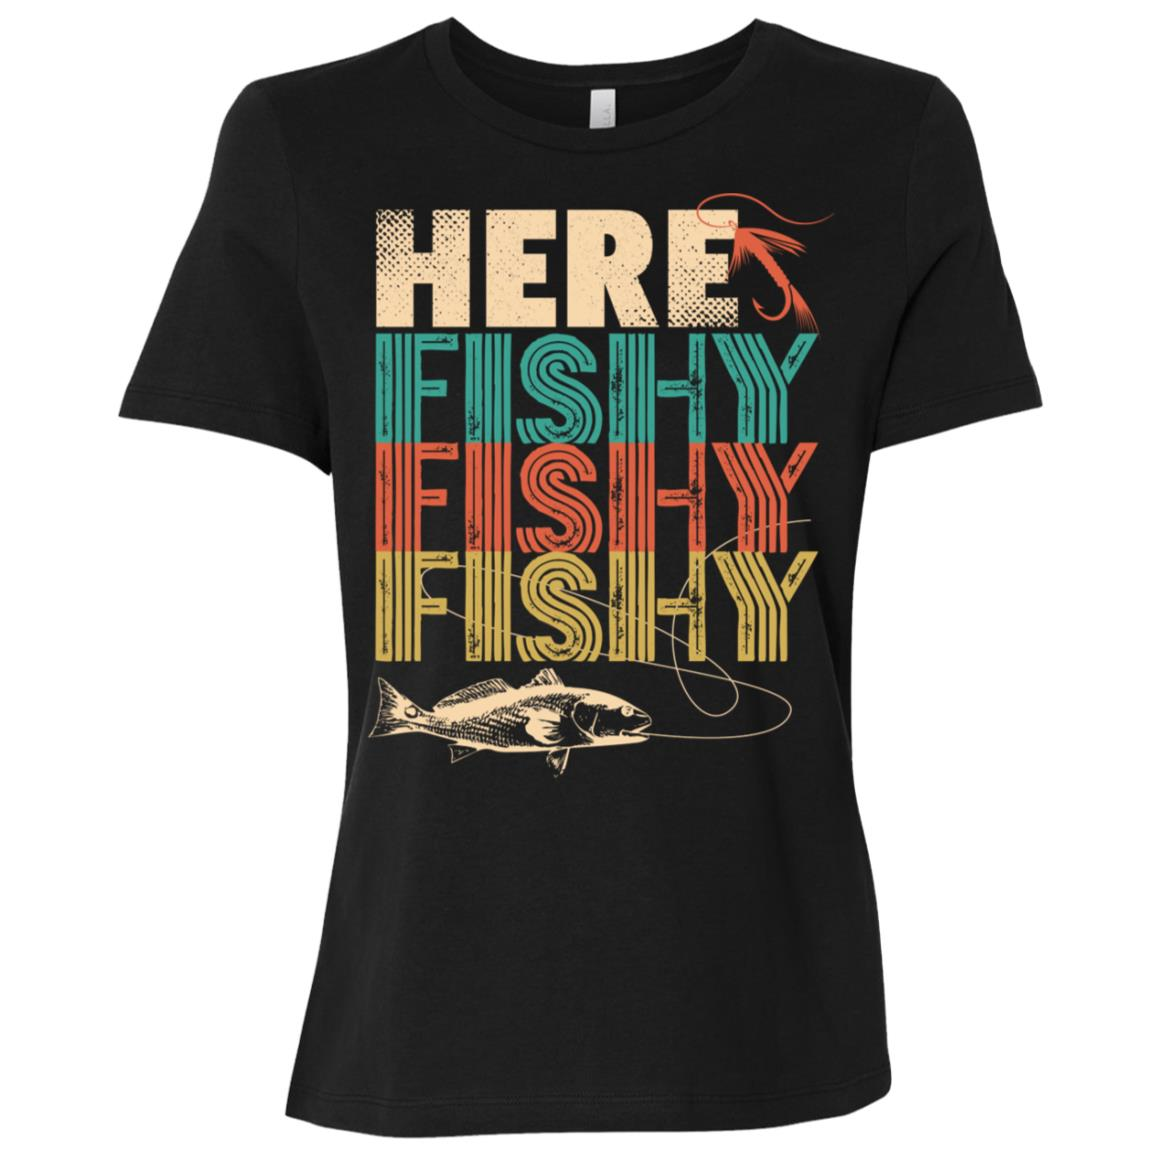 Funny Here Fishy Fishy Fishy Fisherman -4 Women Short Sleeve T-Shirt